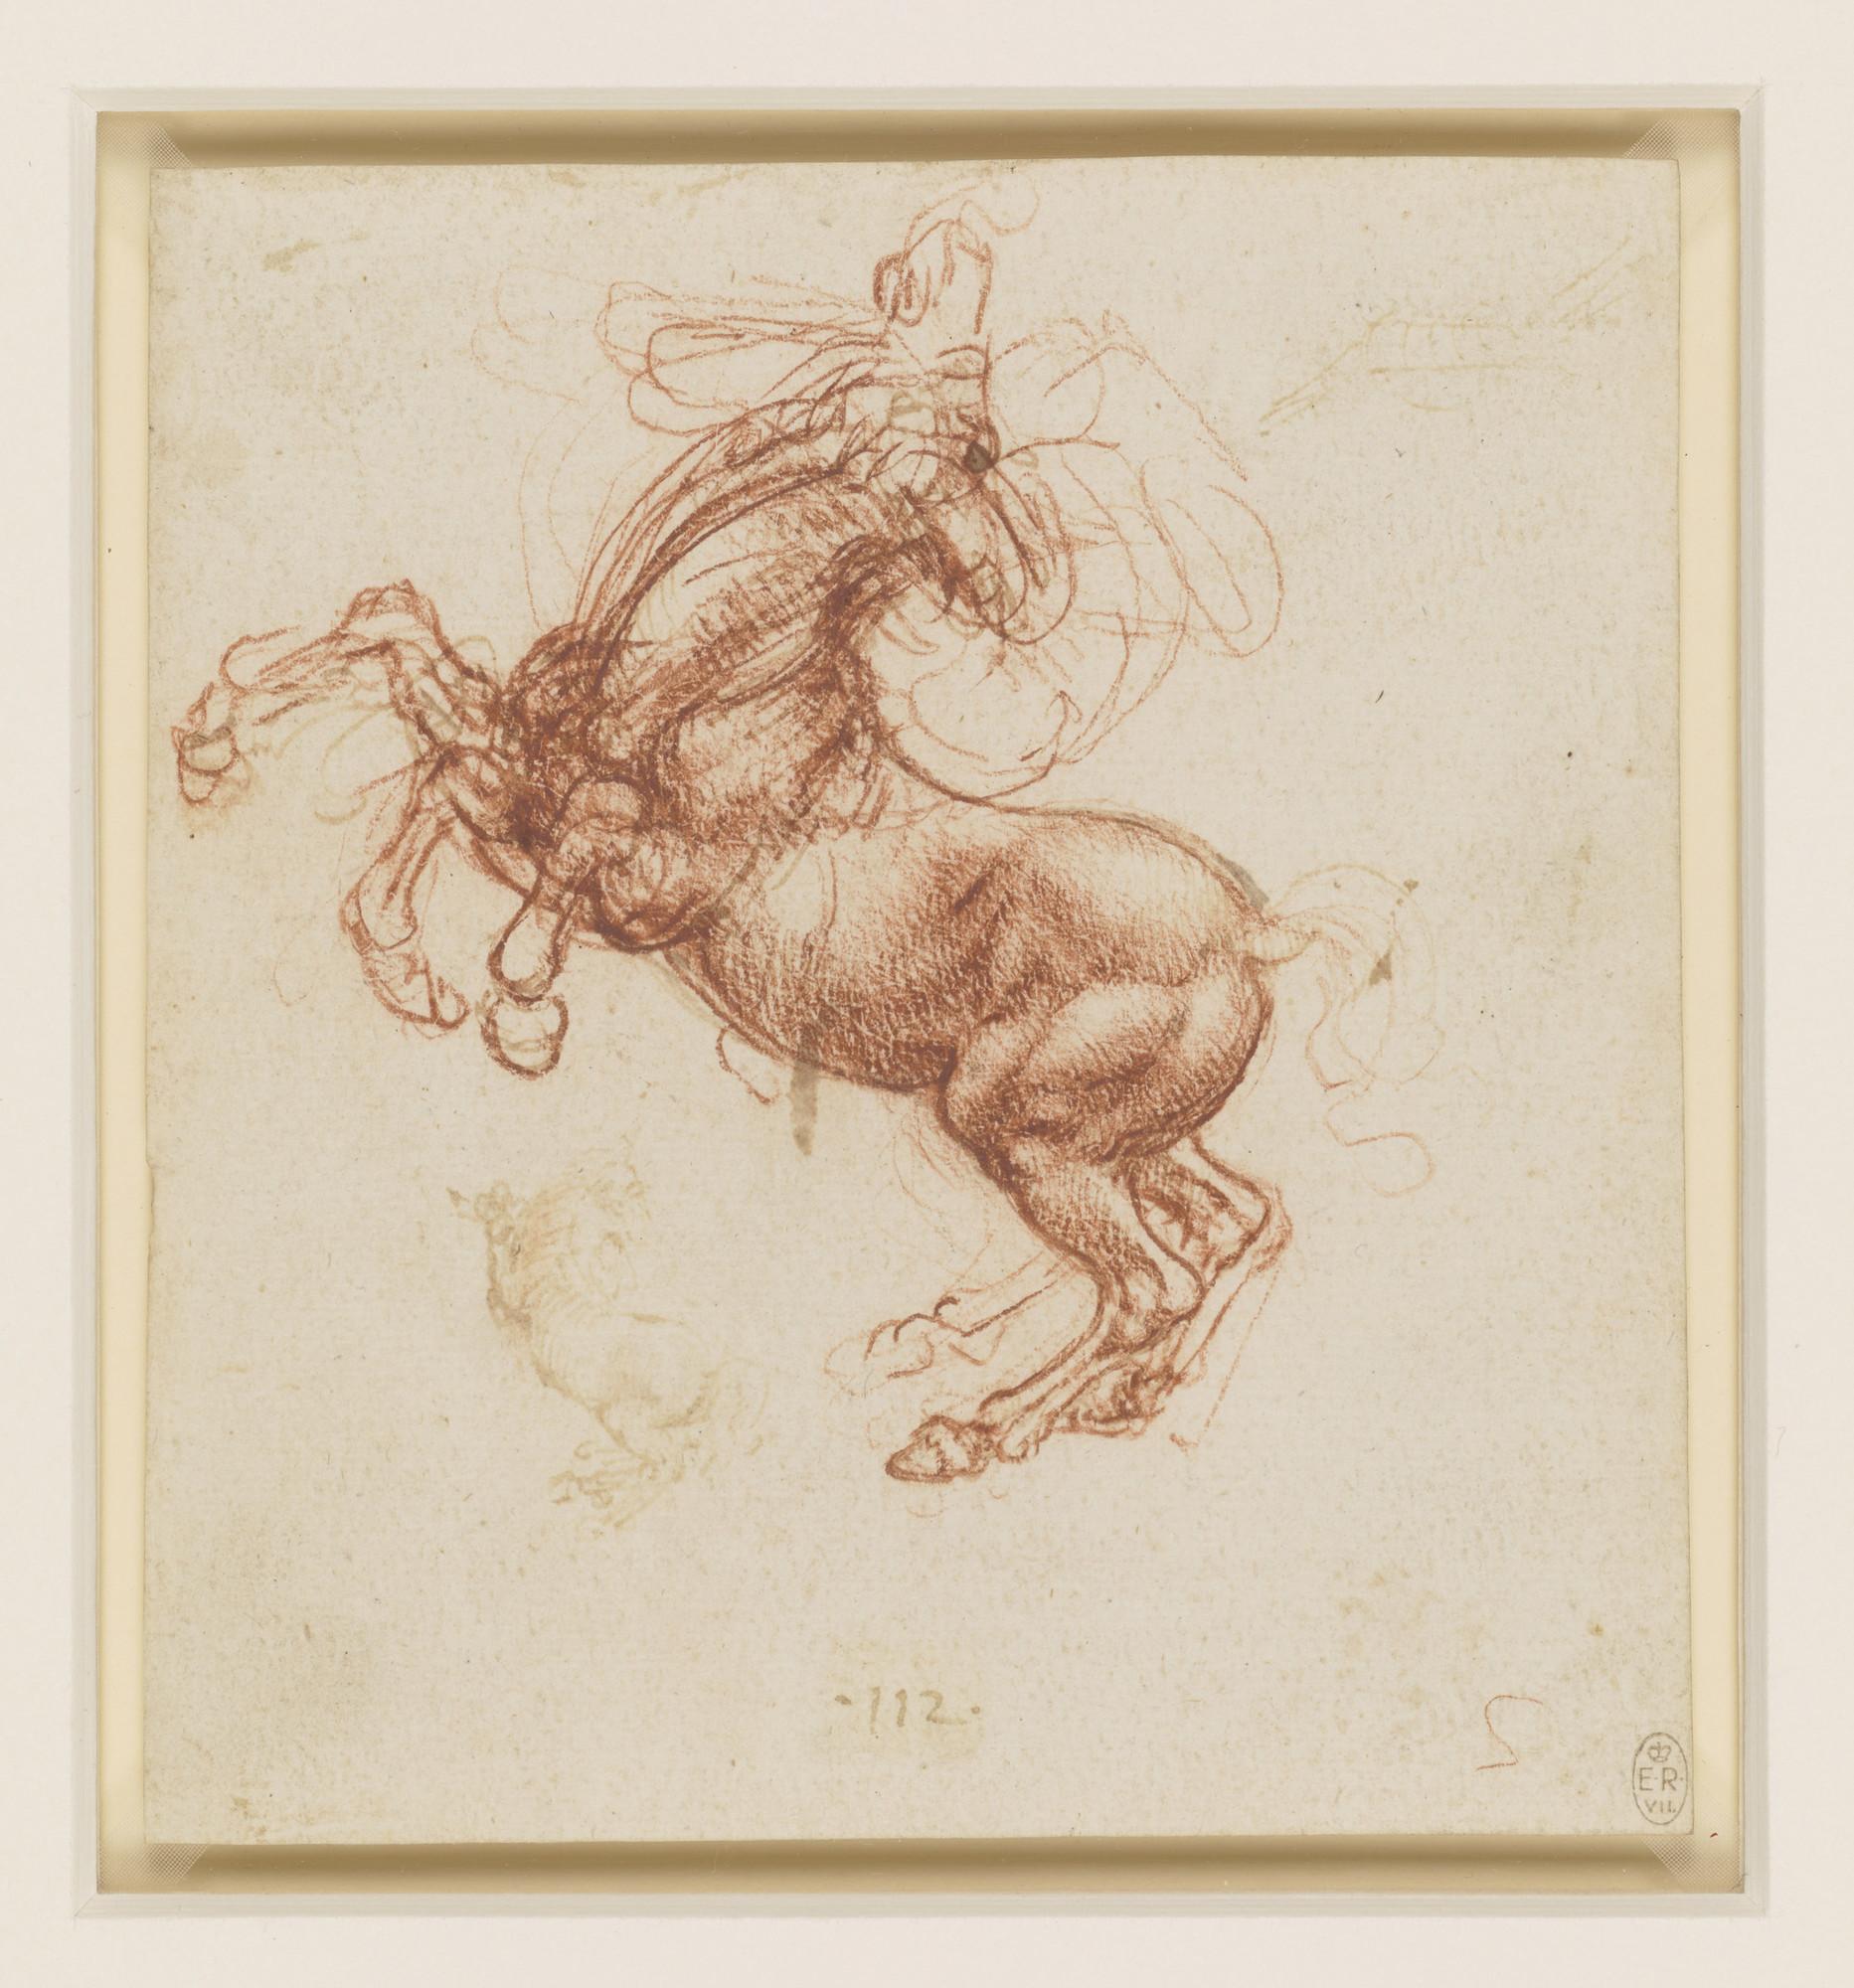 1865x2000 Leonardo Da Vinci (Vinci 1452 Amboise 1519)